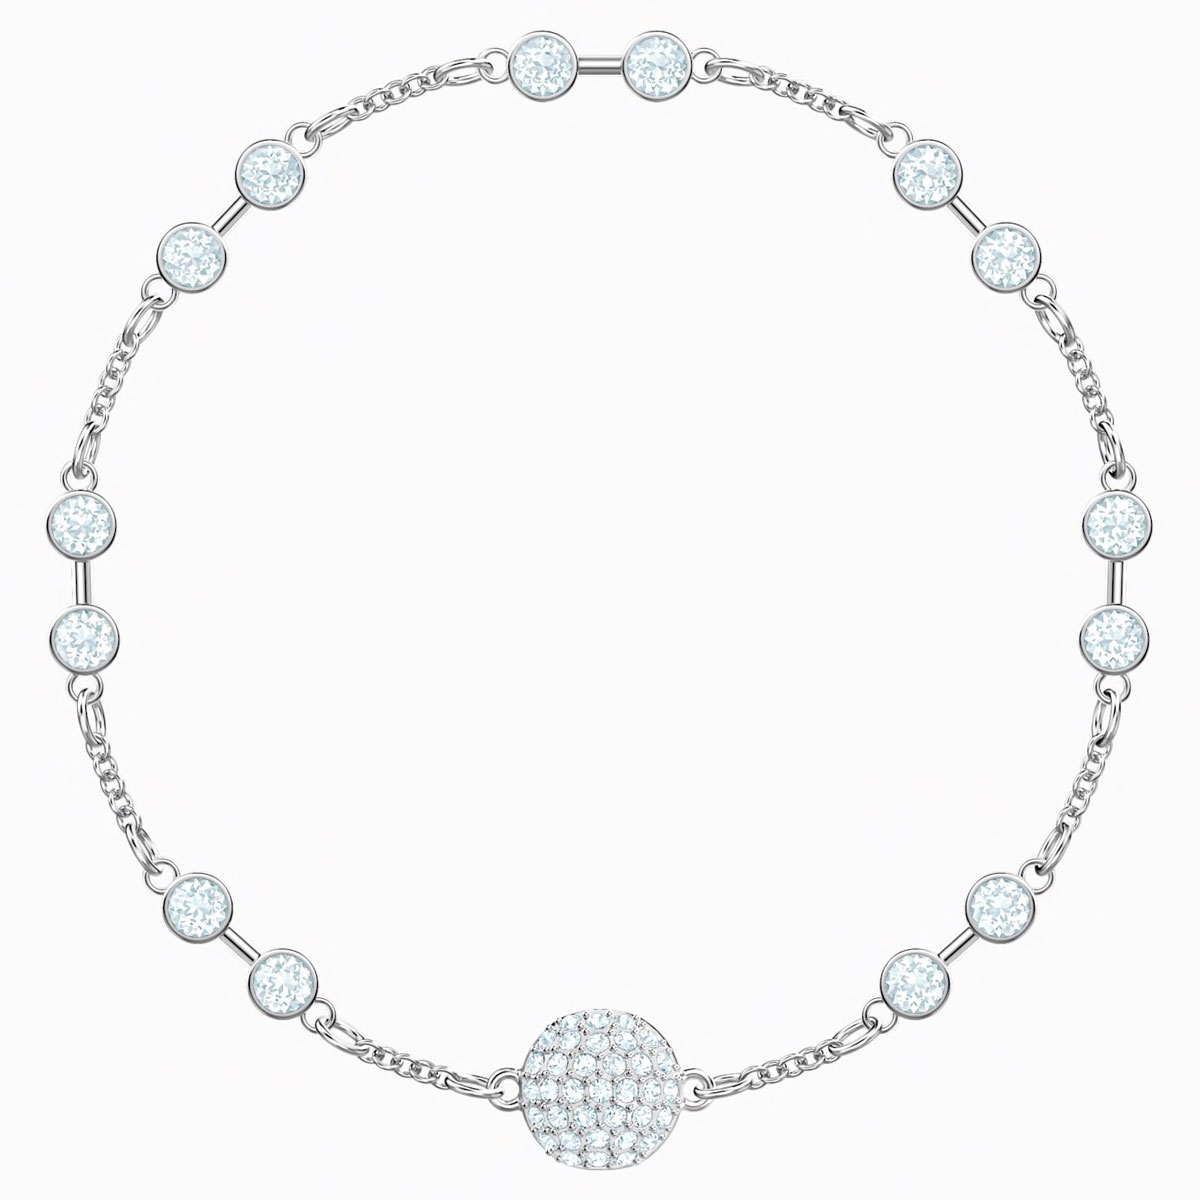 Swarovski Remix Bracelet, White and Rhodium plated